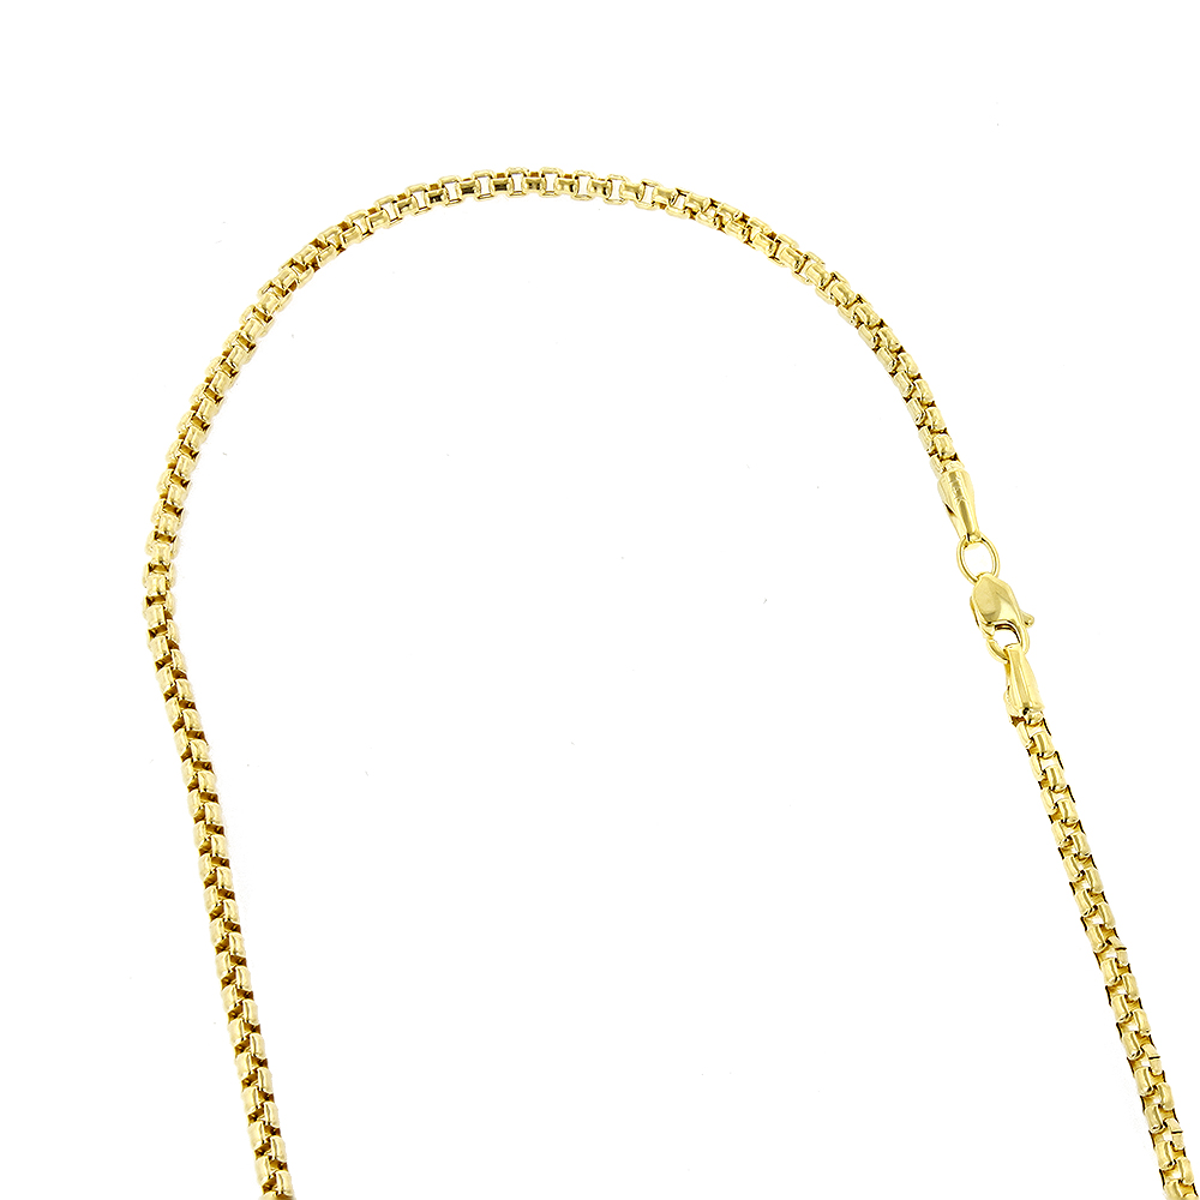 LUXURMAN Solid 14k Gold Box Chain For Men & Women Round 2.8mm Wide